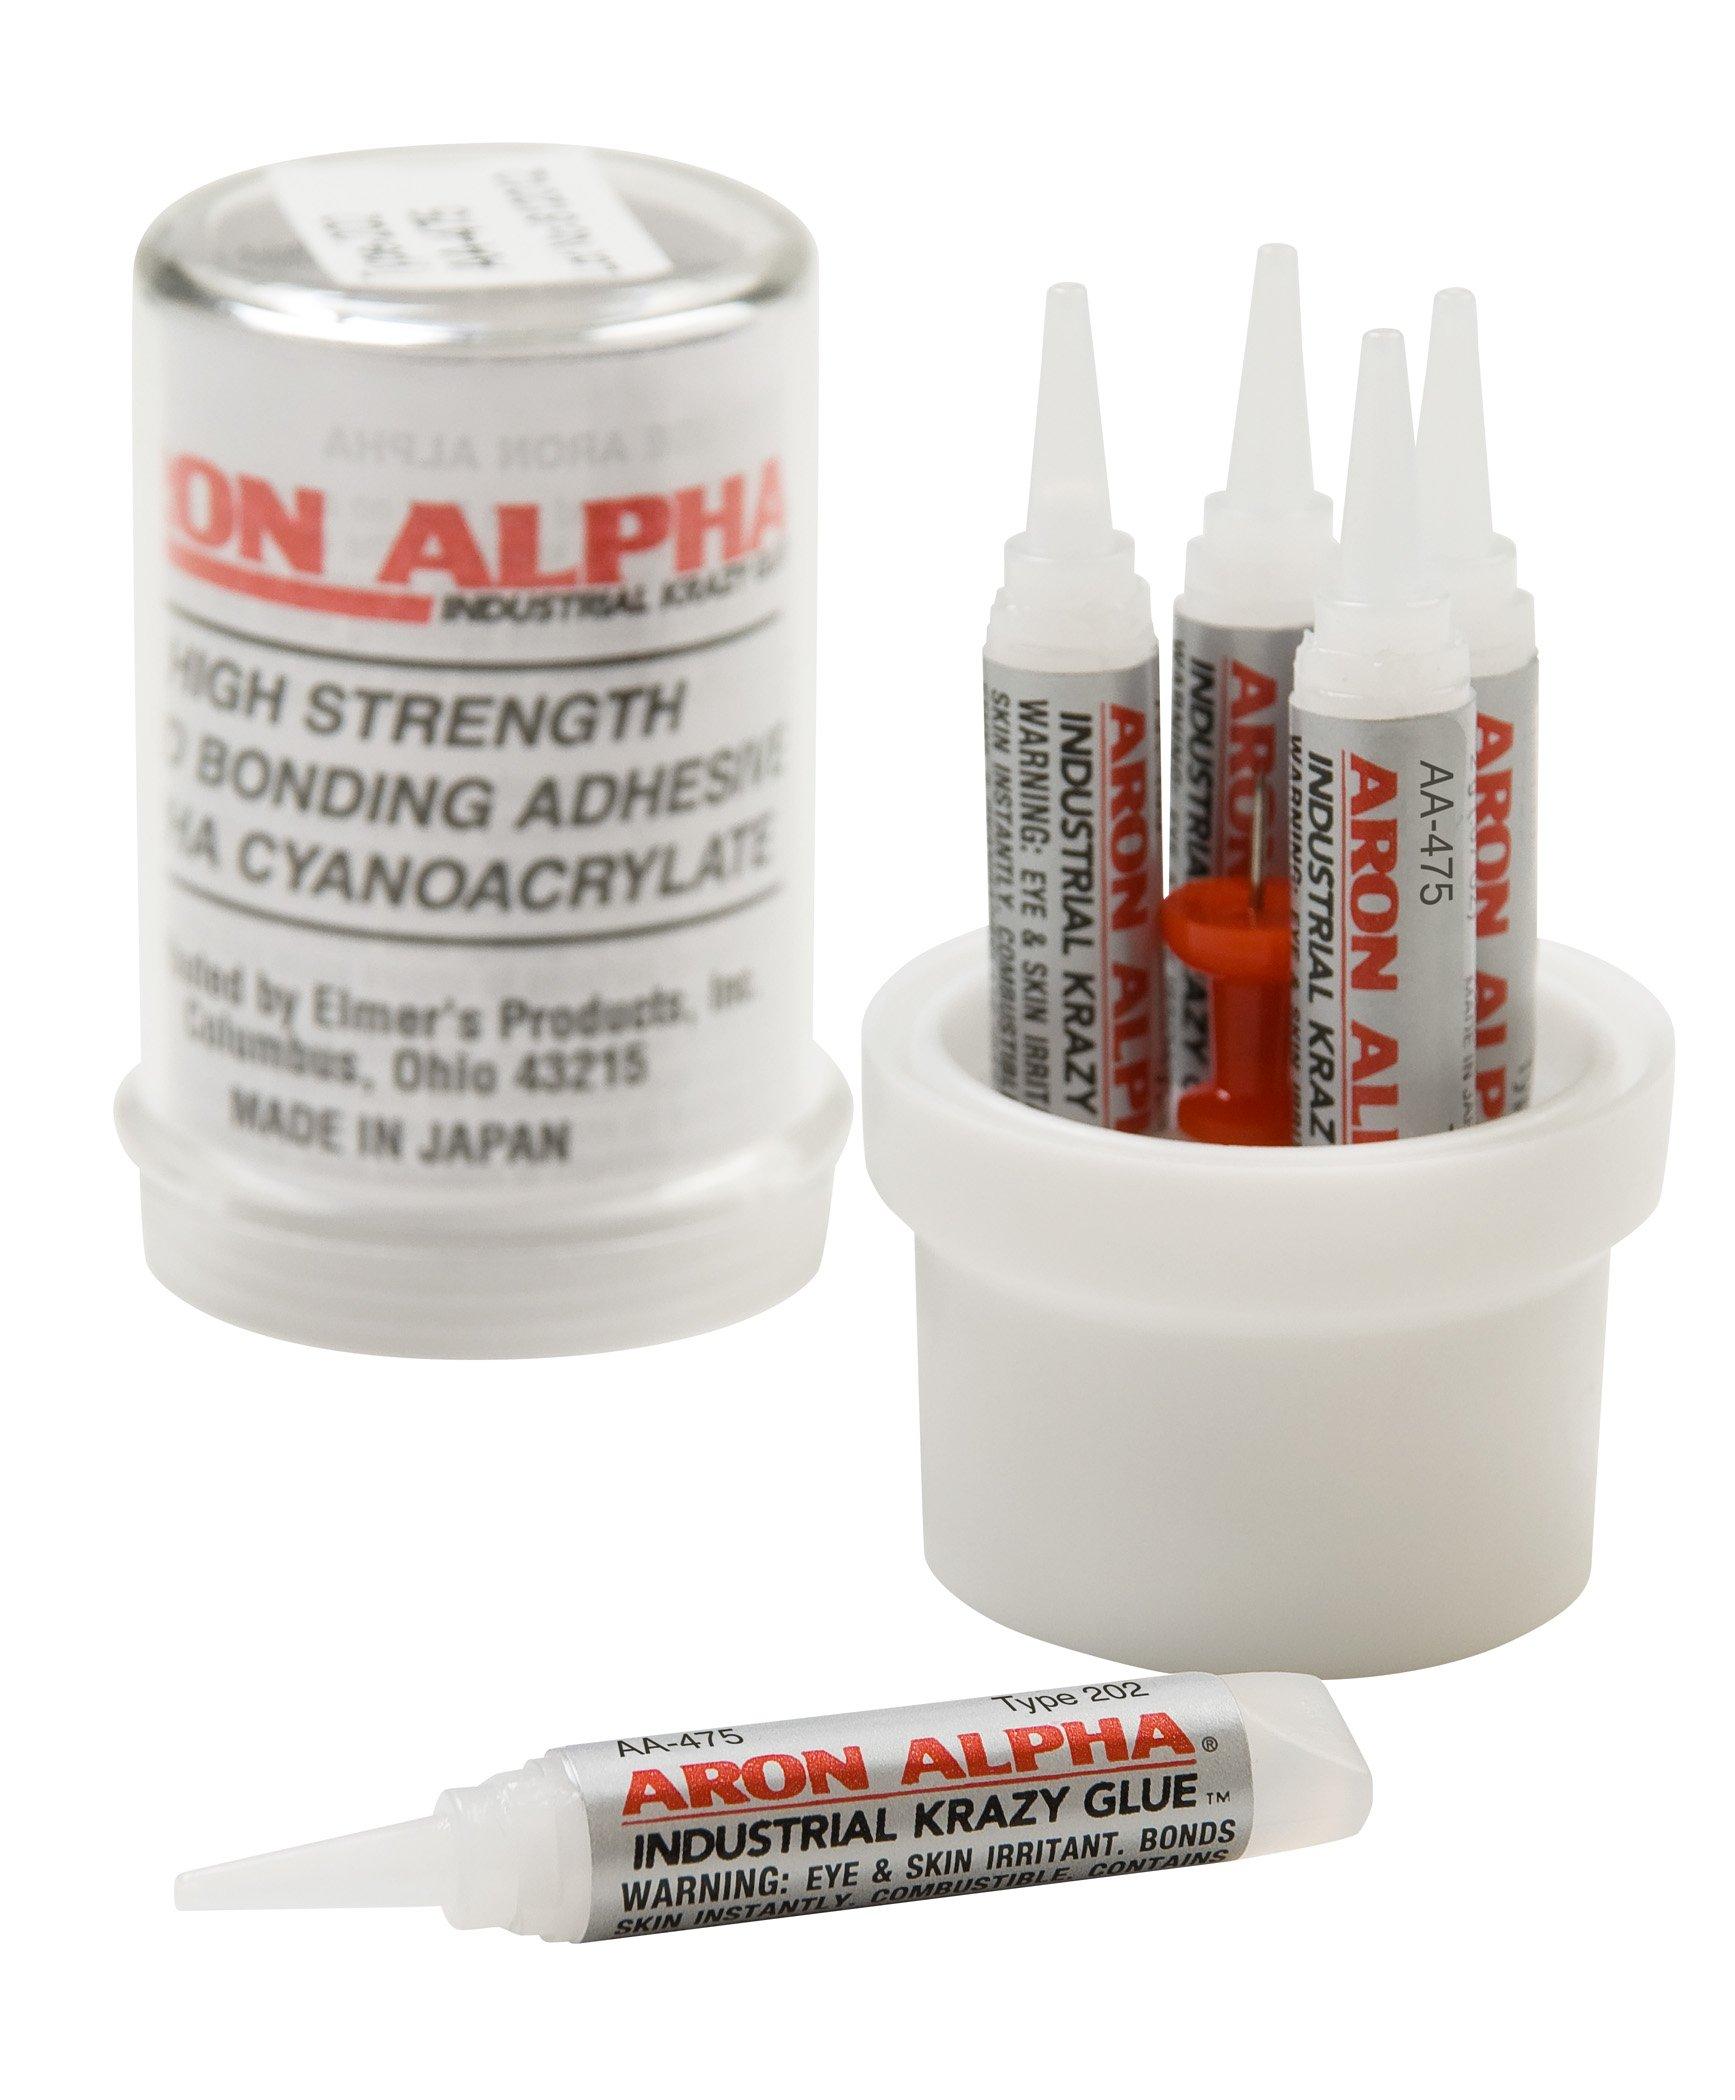 Aron Alpha Type 202 (100 cps viscosity) Regular Set Instant Adhesive, 10 g Capsule, 5 Tubes x 2 g (0.07 oz)